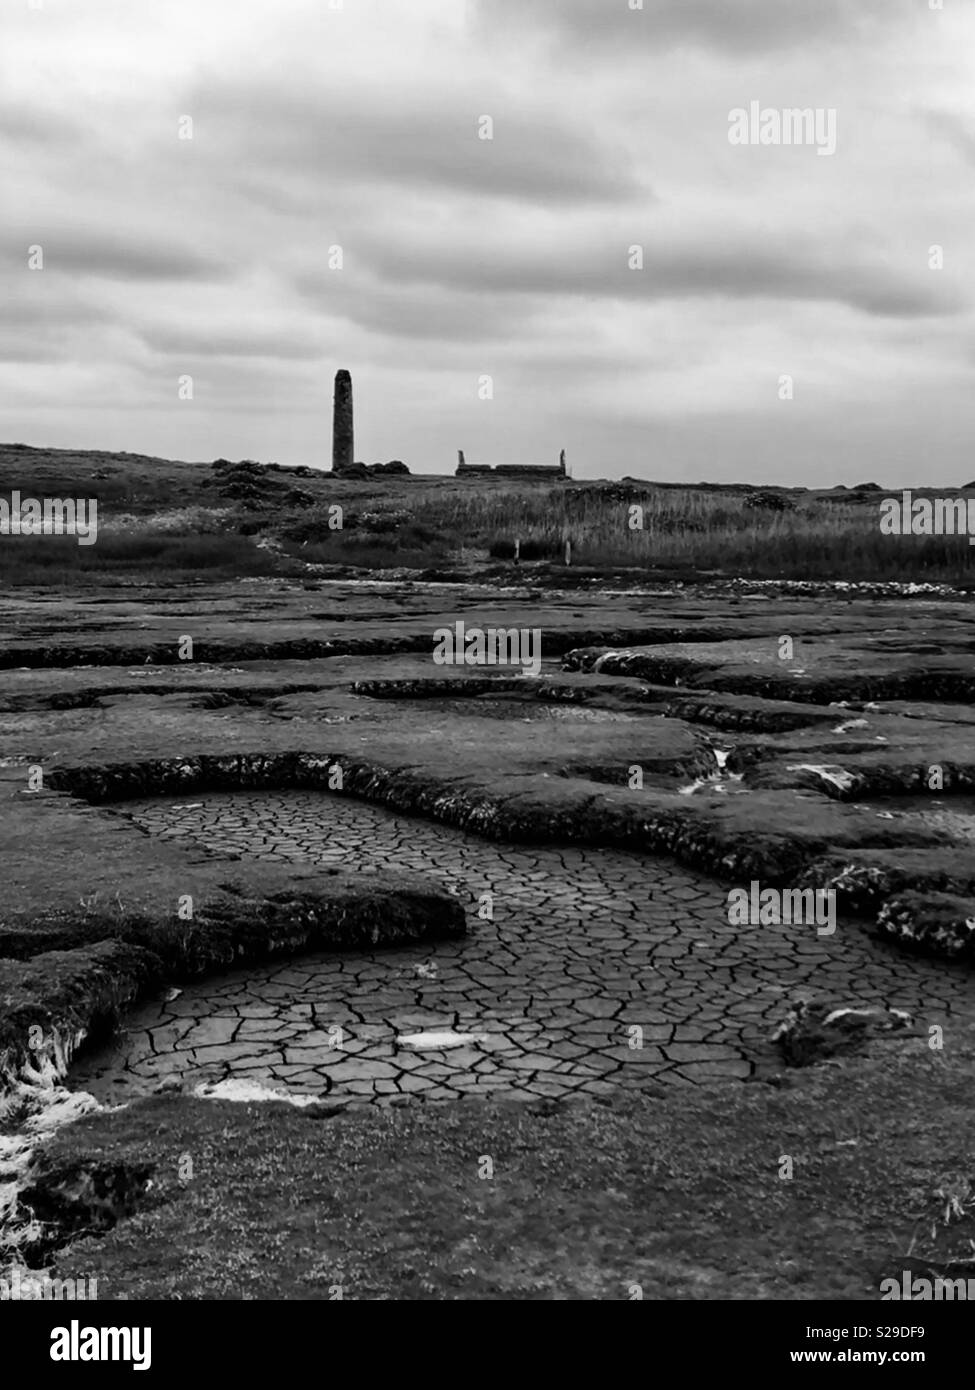 Island Life, West of Ireland - Stock Image